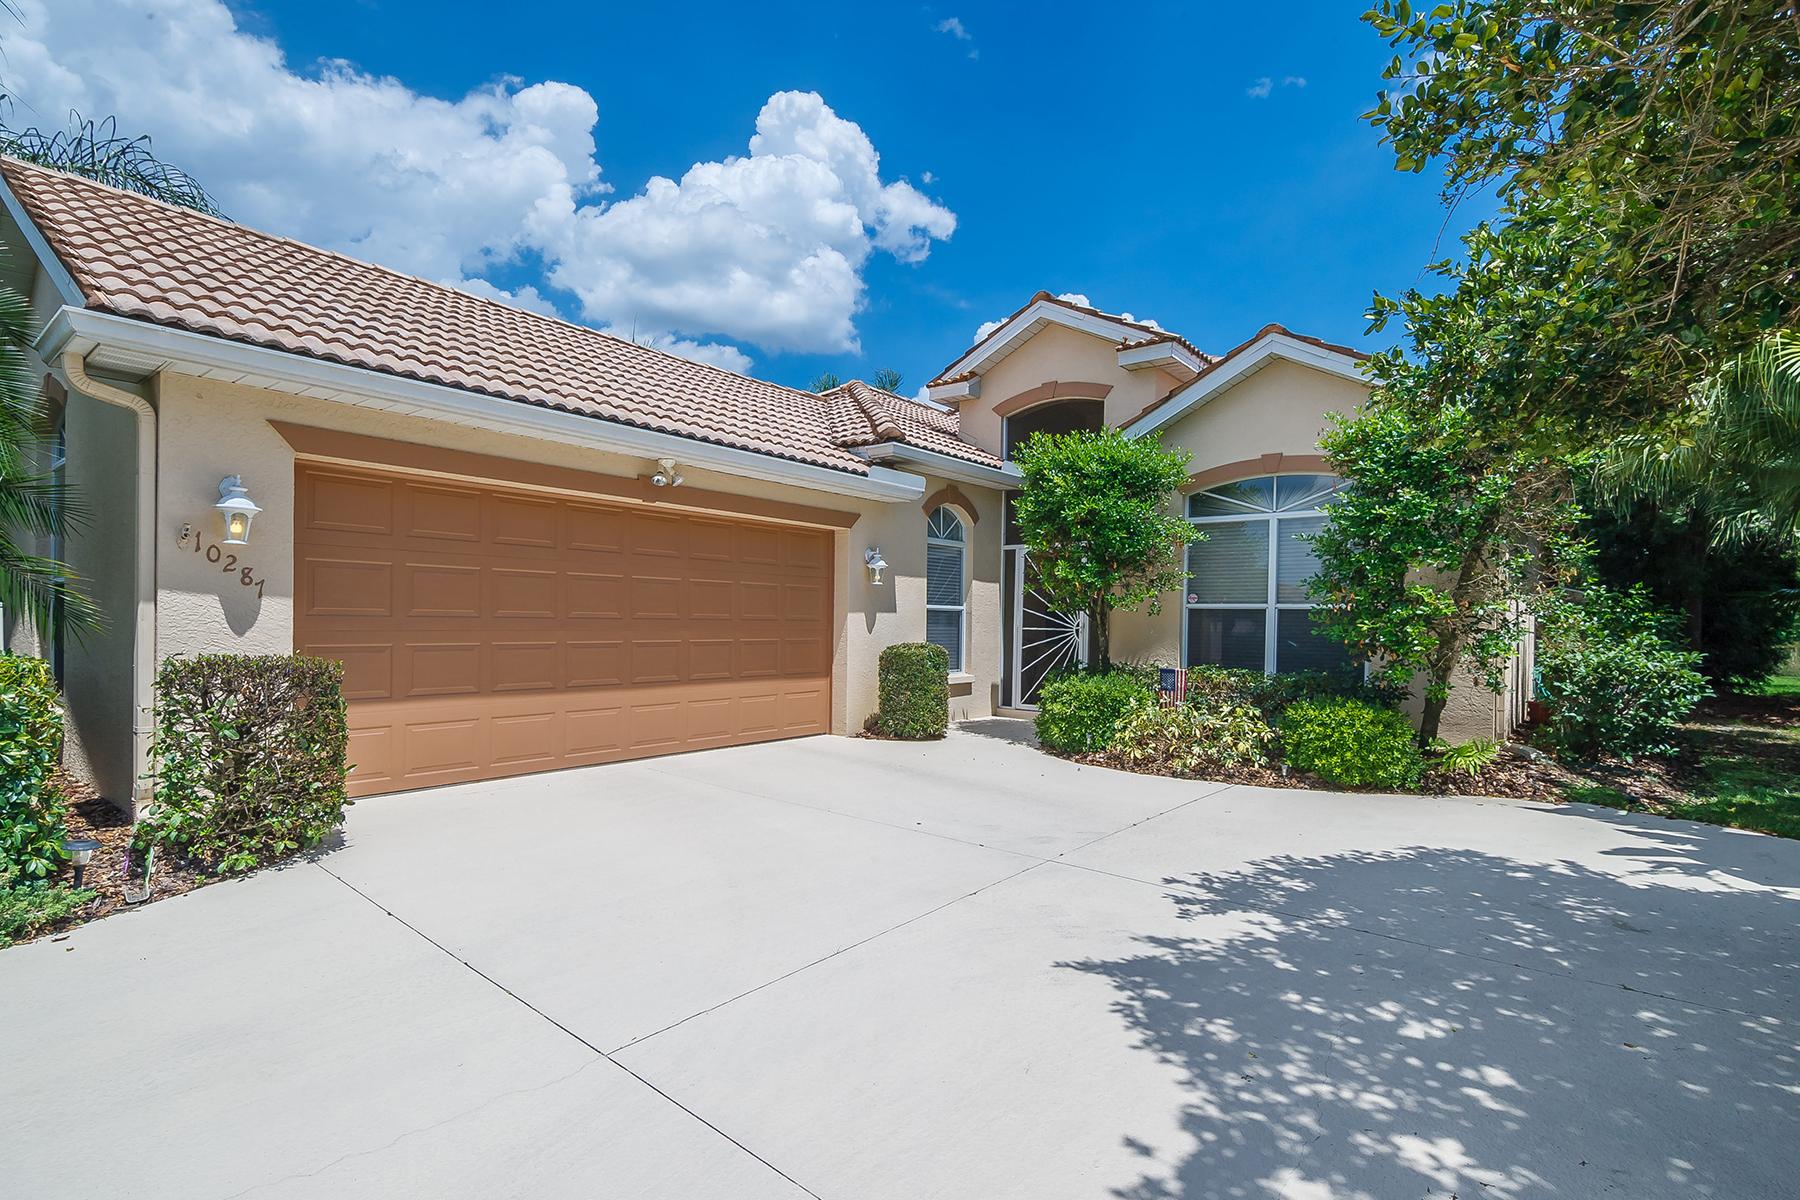 Single Family Home for Sale at RIVER CLUB SOUTH 10287 Silverado Cir Lakewood Ranch, Florida, 34202 United States